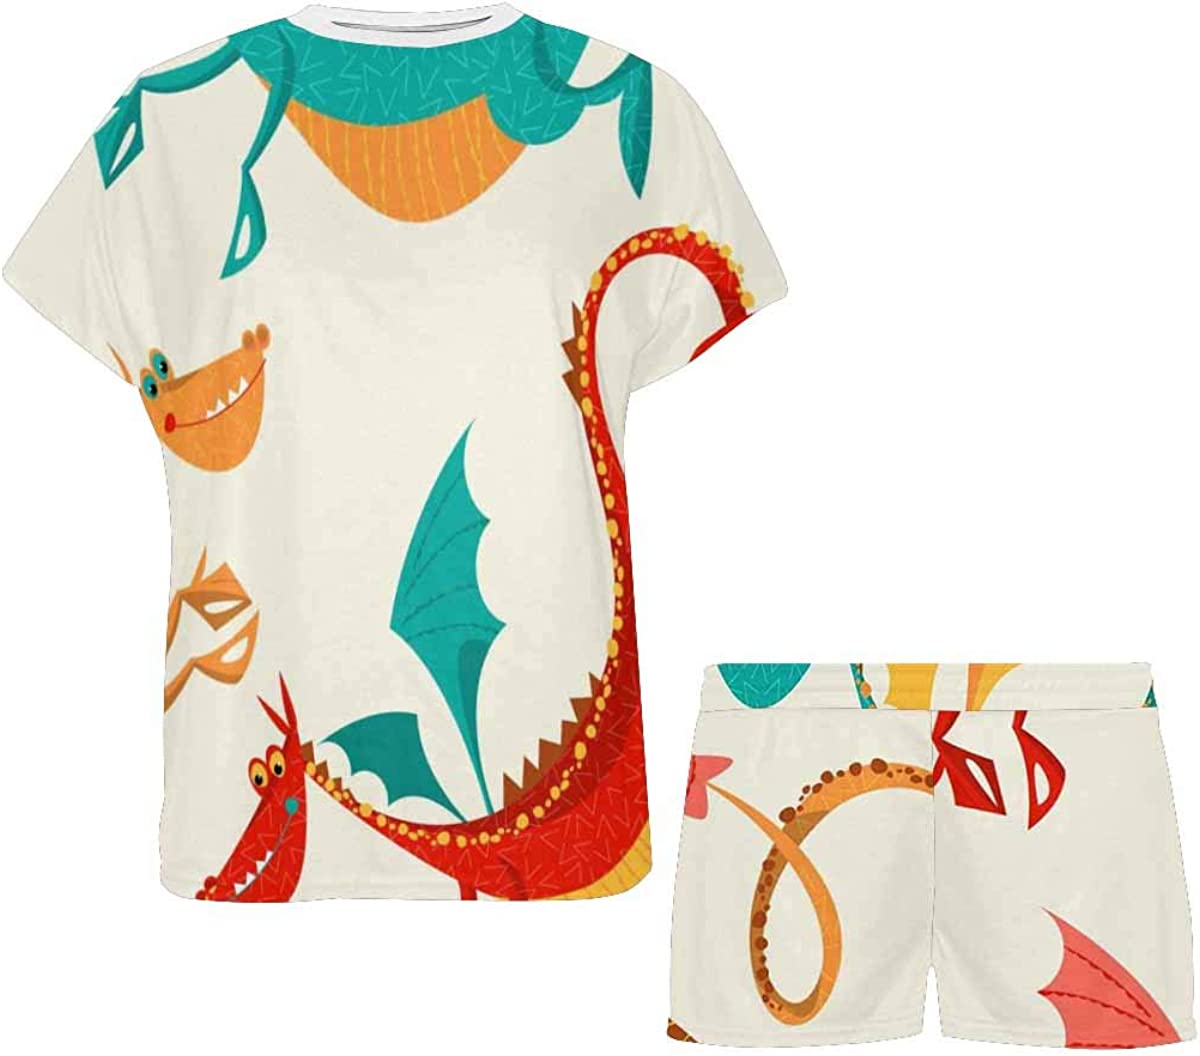 INTERESTPRINT Multicolored Funny Dragons Women's Breathable 2 Piece Shorts Pajama Sleepwear Set